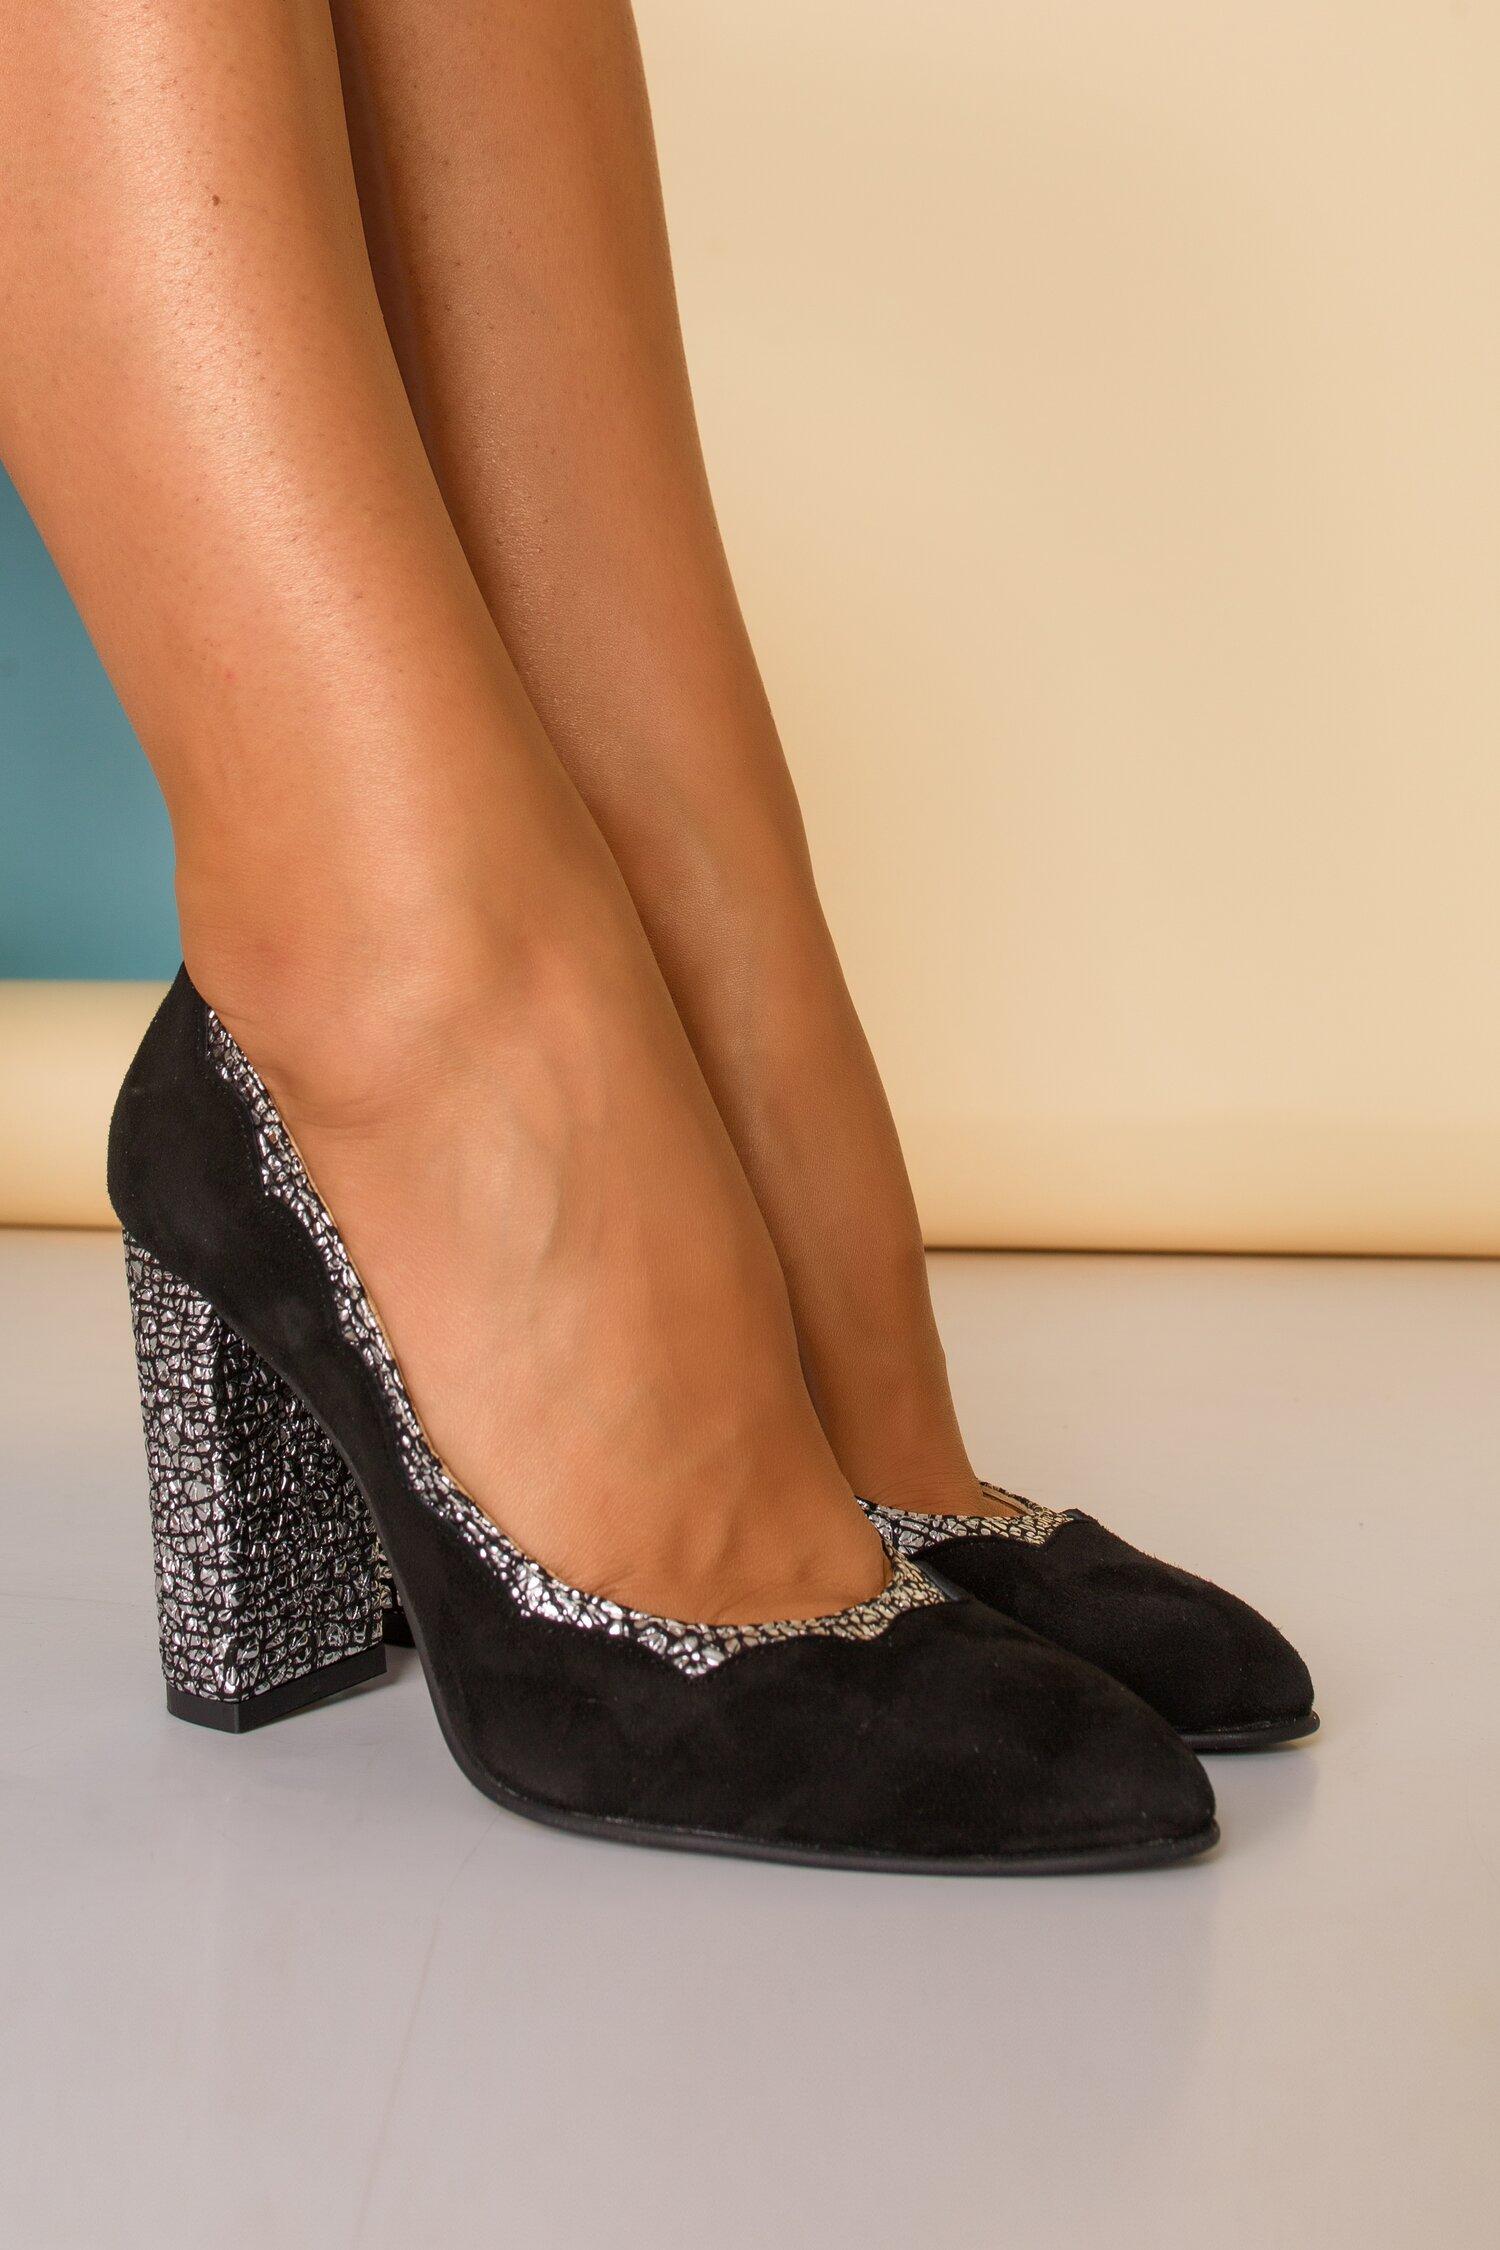 Pantofi negri eleganti cu insertii argintii imagine